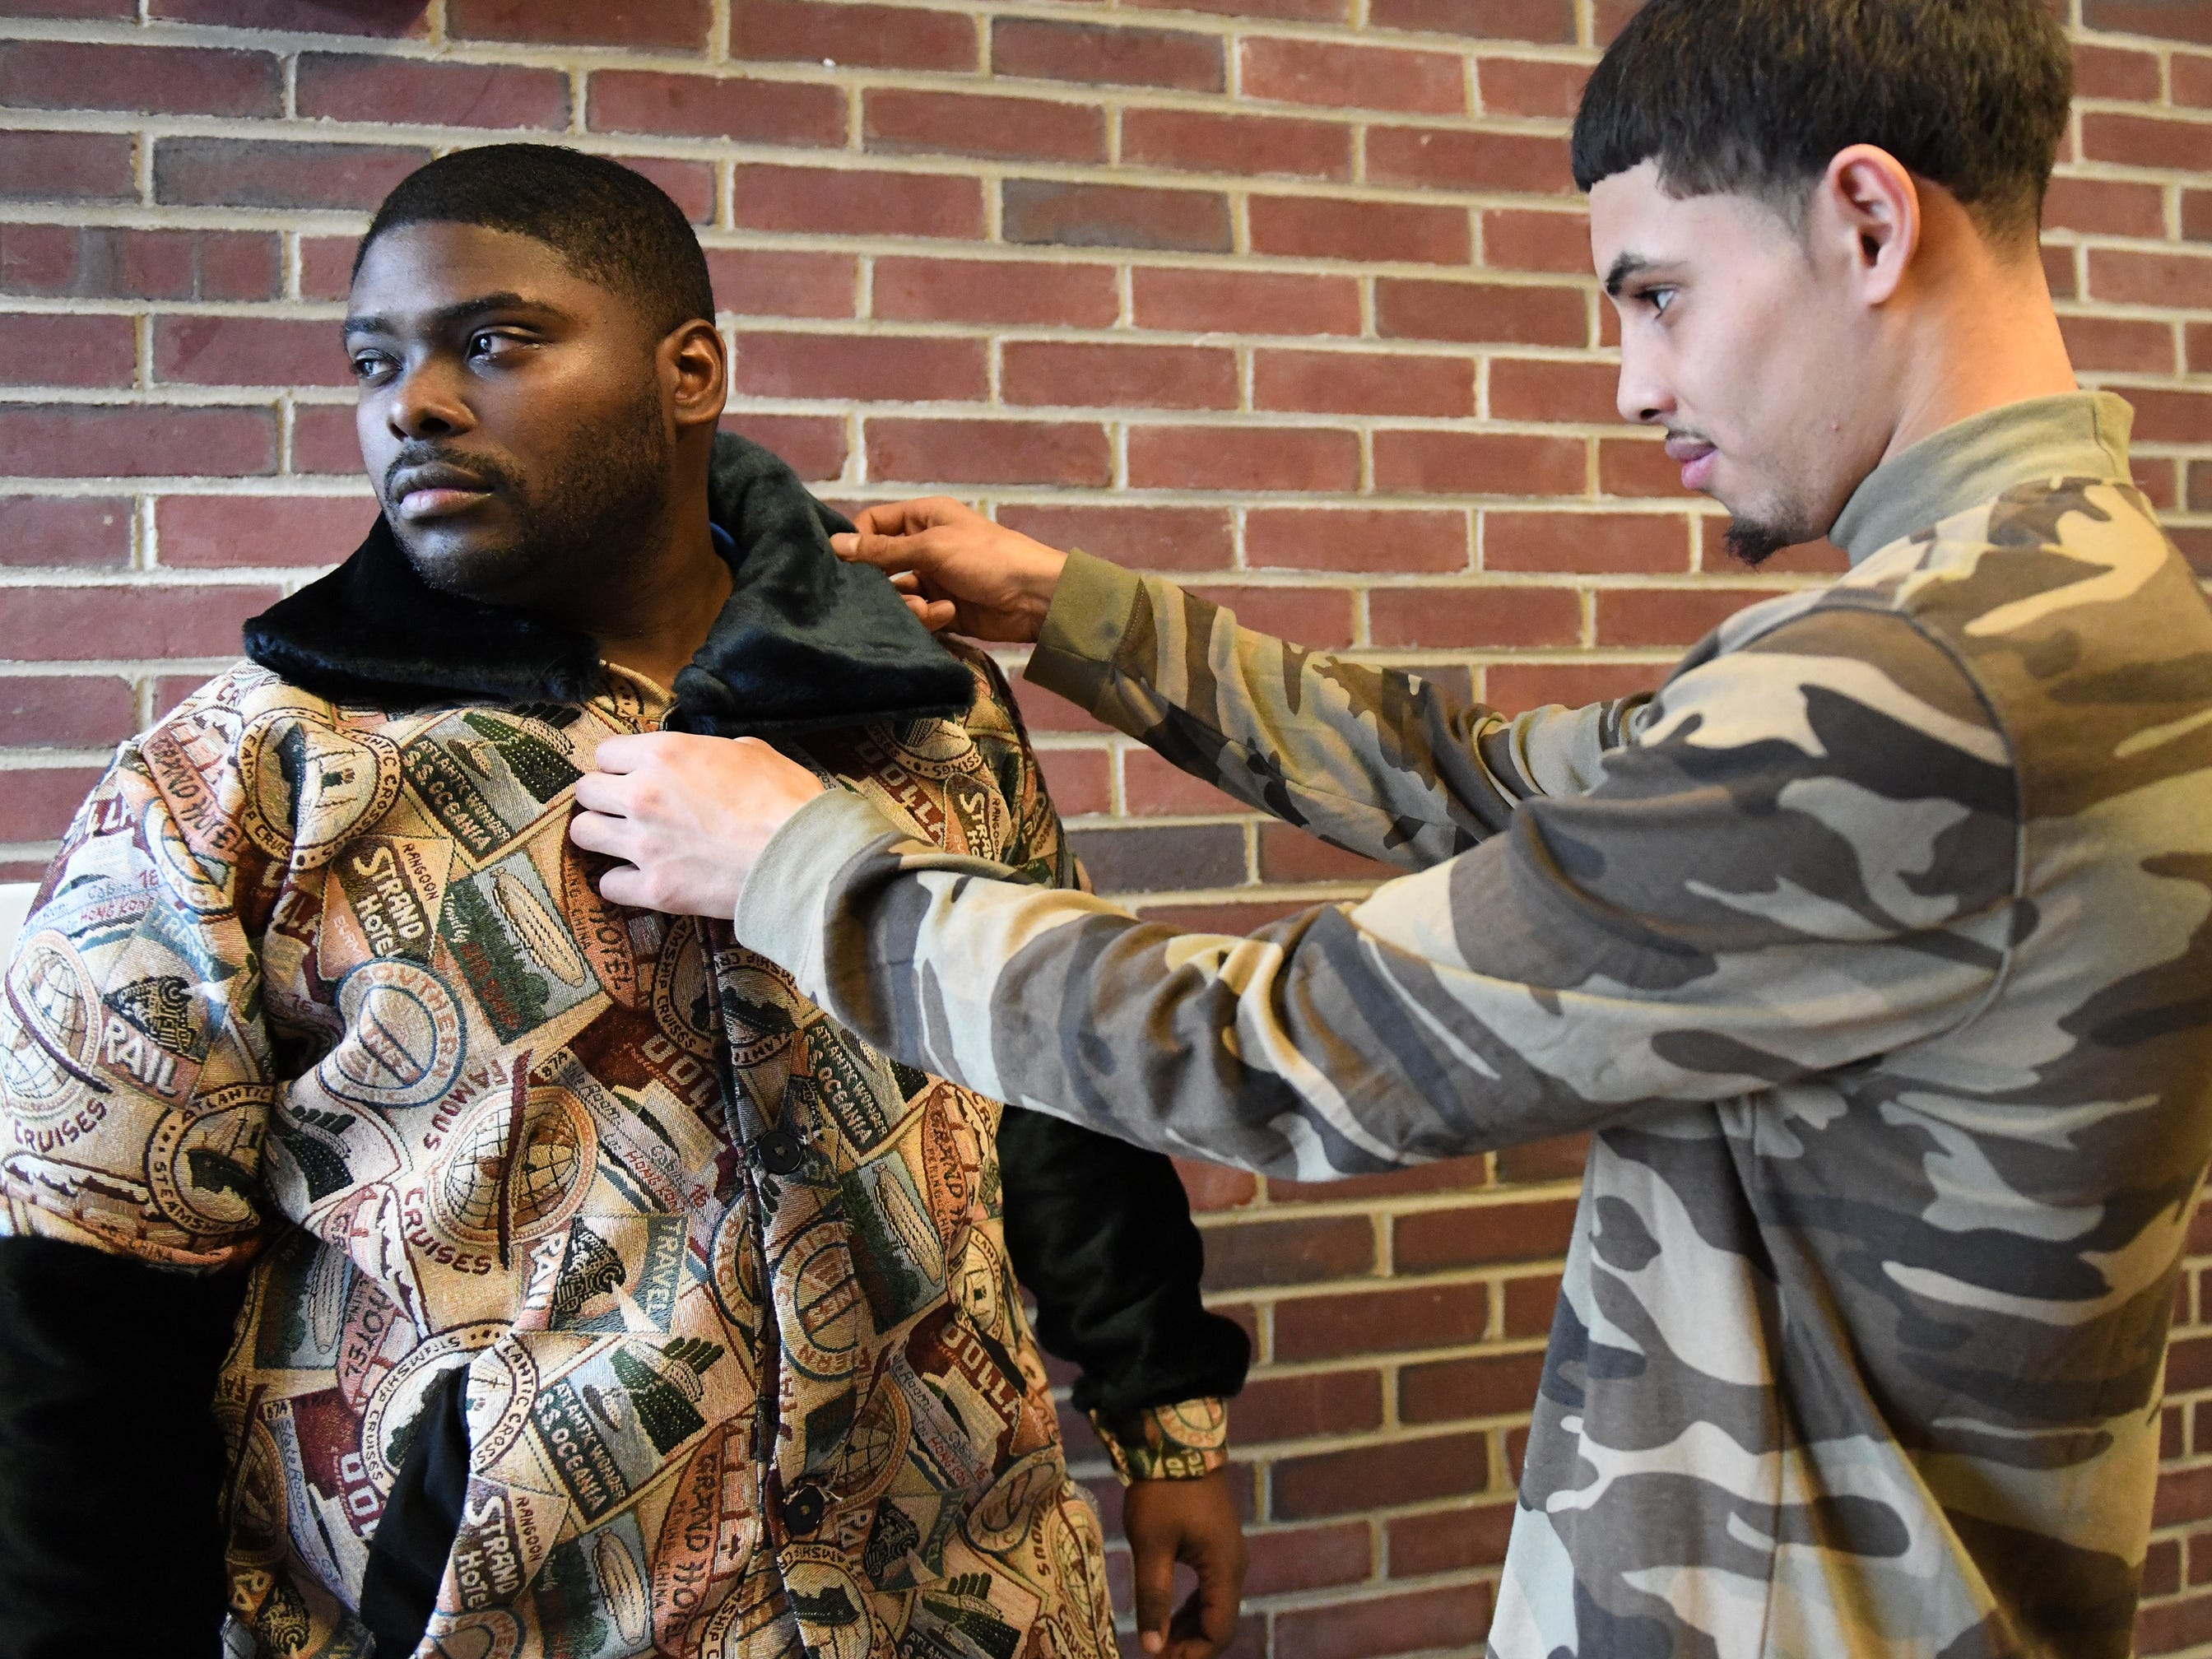 Fabricio Lobo (right) adjusts the collar on a coat he designed while Cunningham Academy staffer Zaquiiran Jones helps show off the garment on Thursday, Jan. 24, 2019.